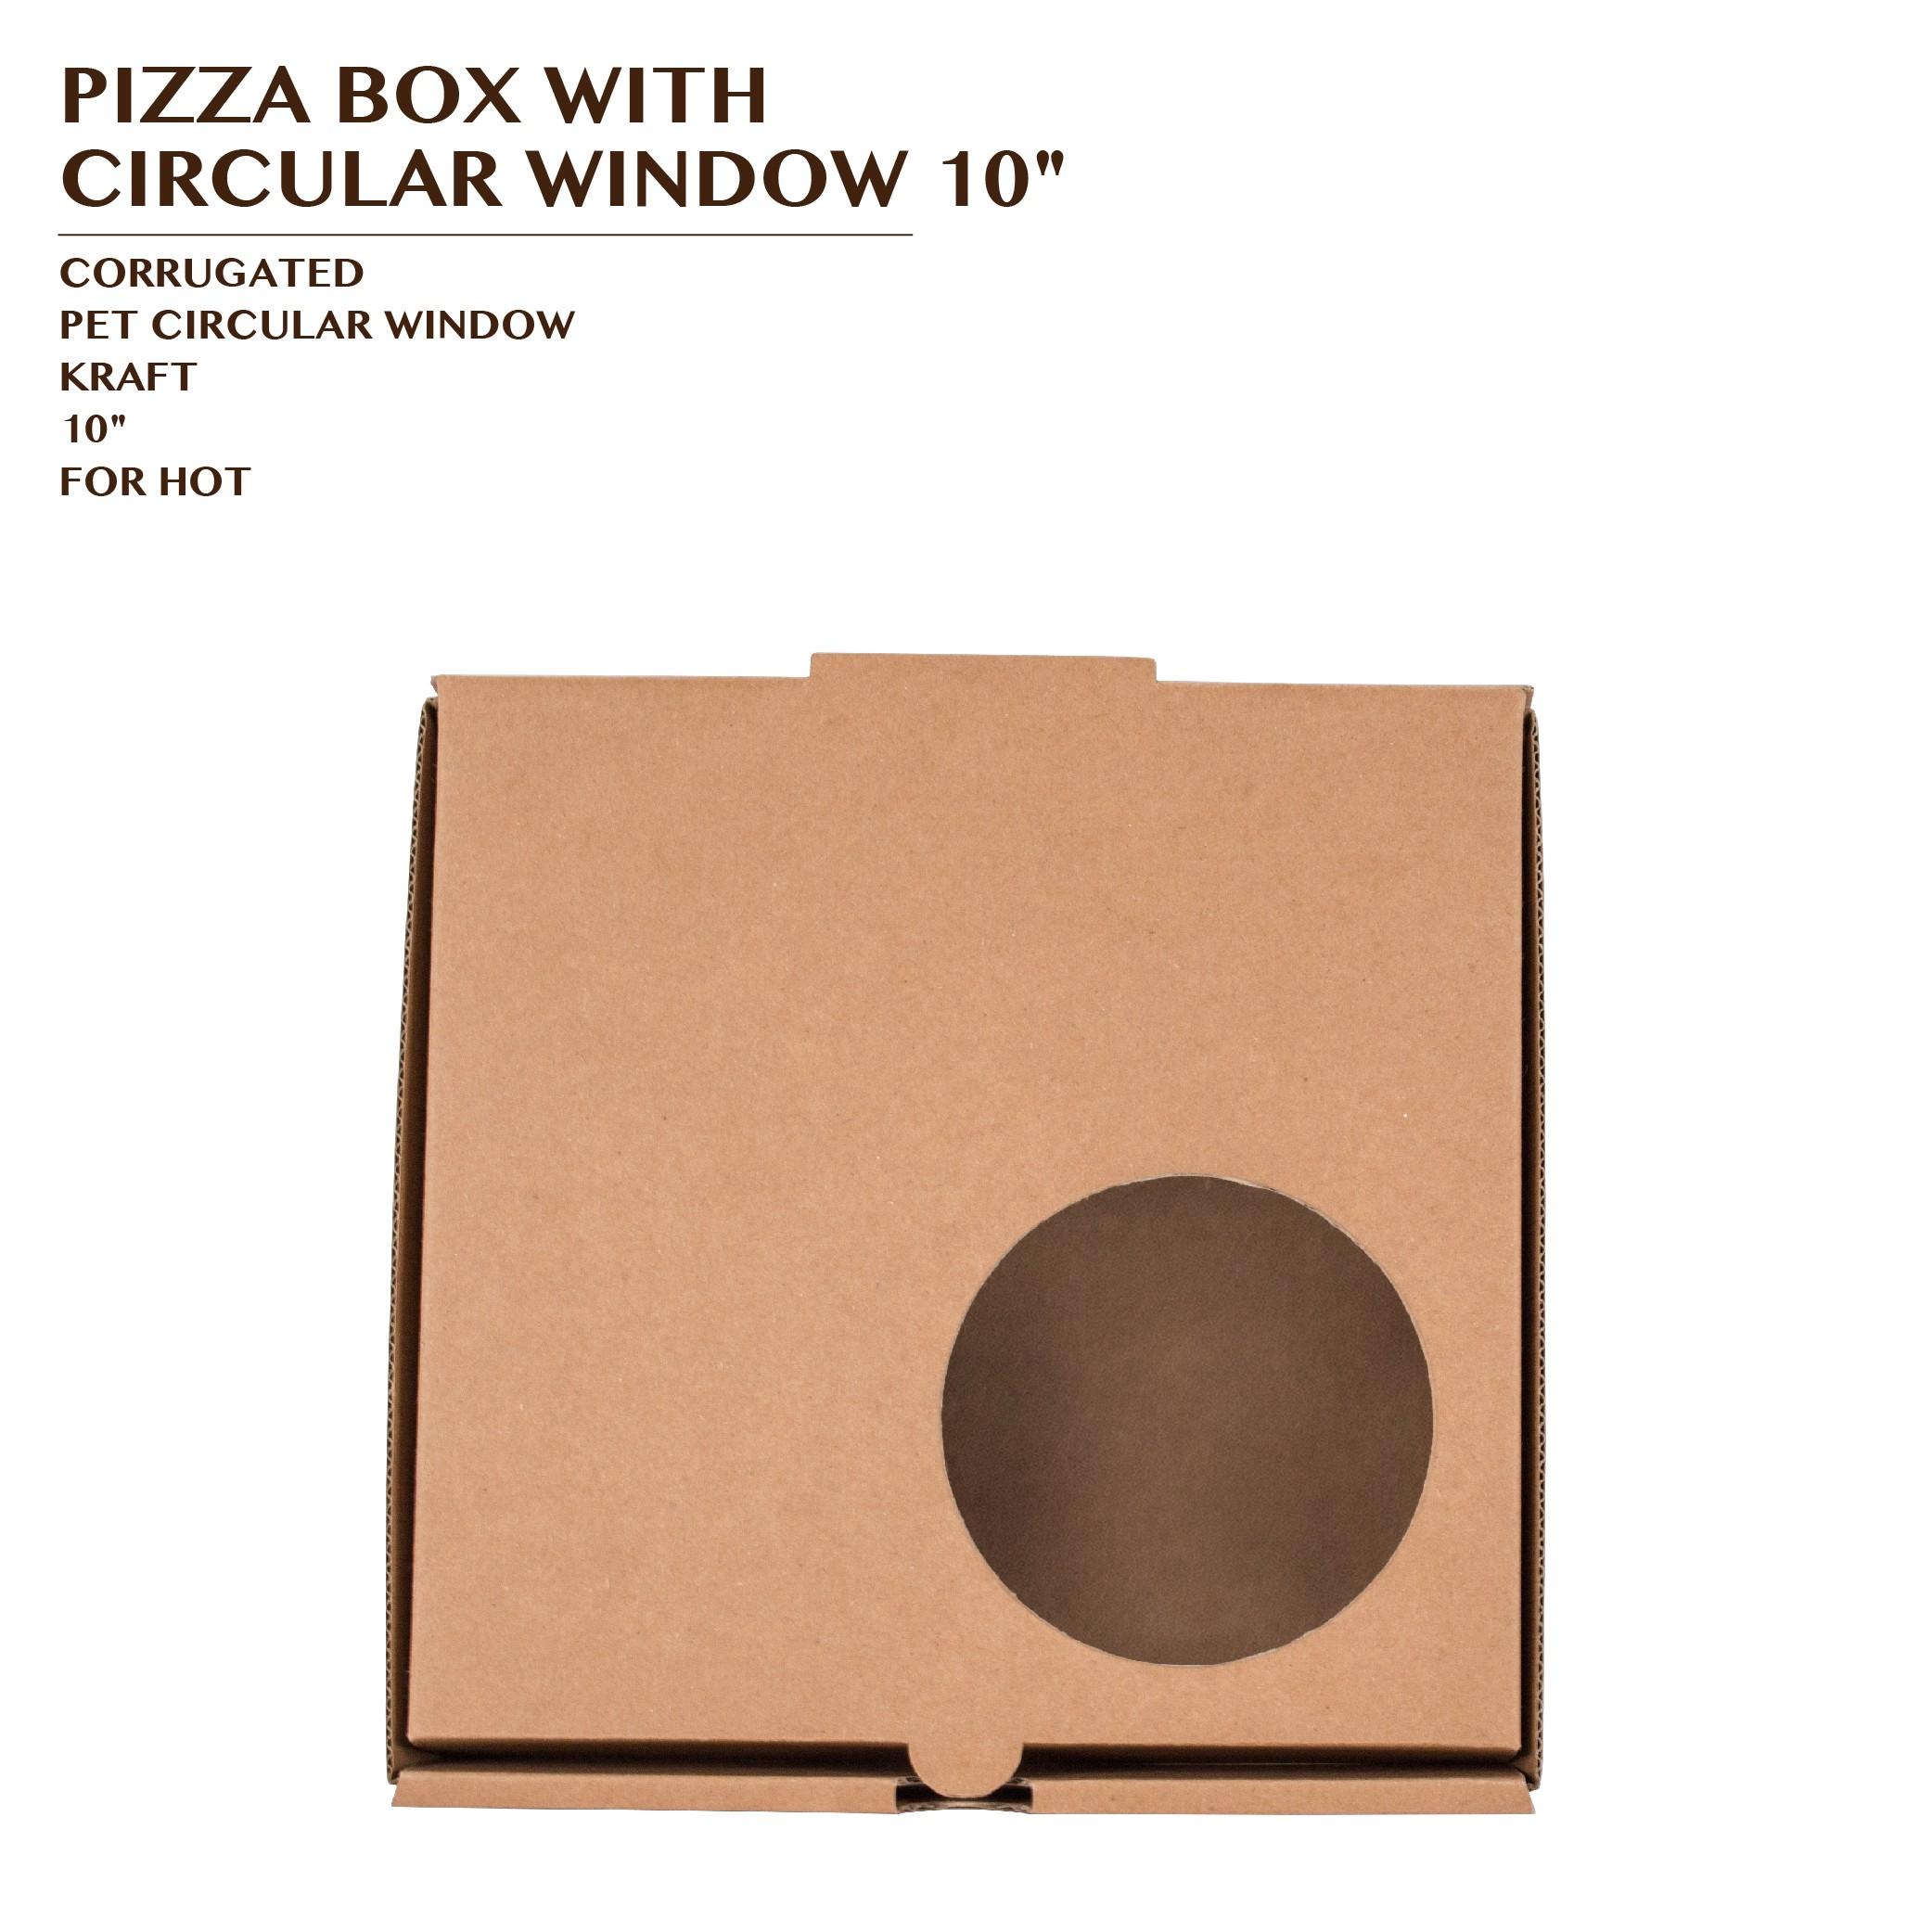 "PRE-ORDER PIZZA BOX WITH CIRCULAR WINDOW 10"""